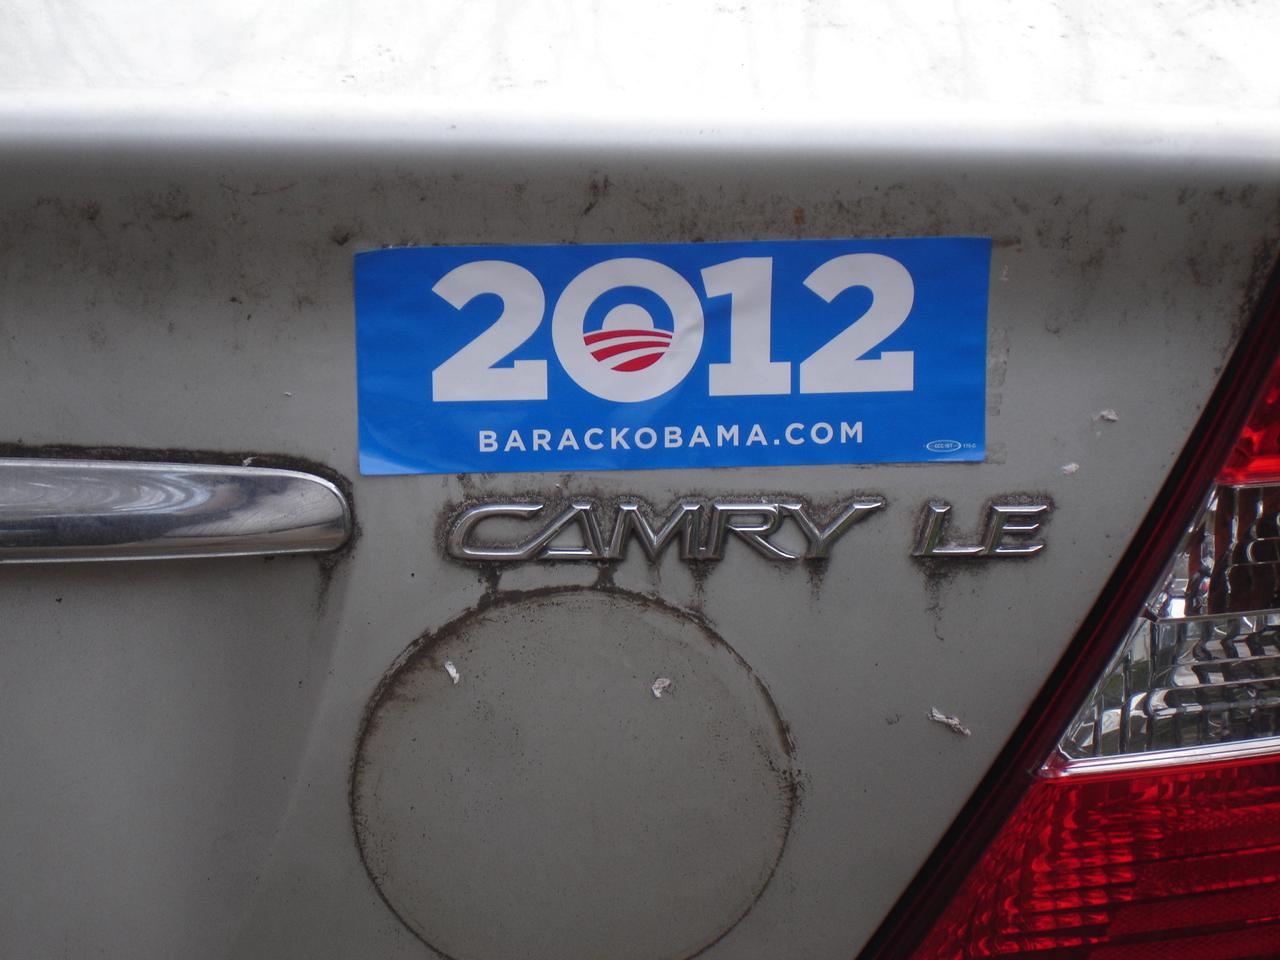 Bumper sticker design tips - Someone Ripped Our Obama Bumper Stickers Off Our Car